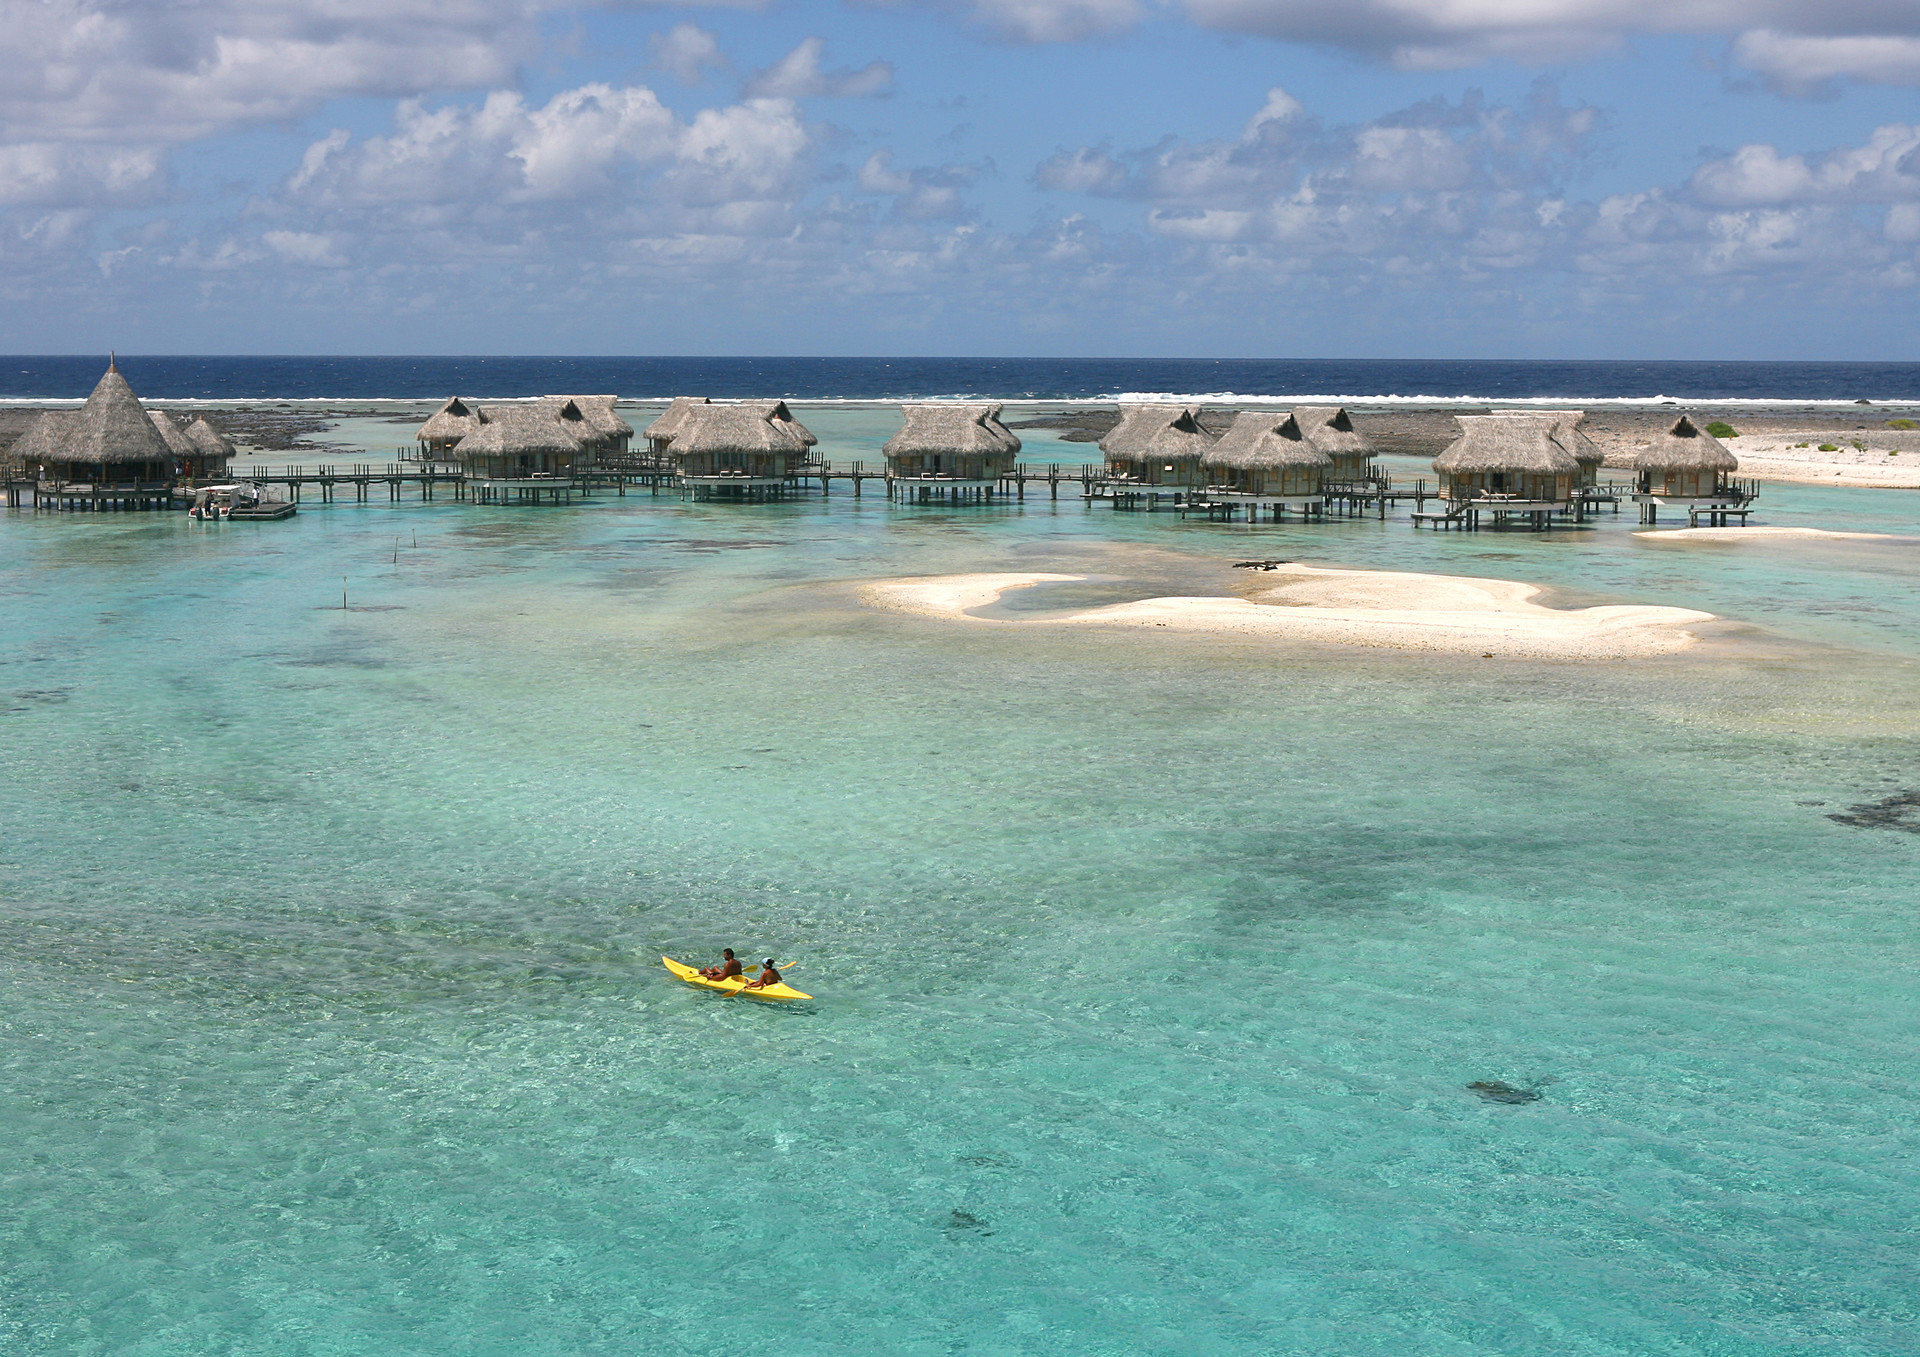 water sky Beach Sea shore Coast Nature Ocean wind wave wave sand Lagoon cape vehicle cove reef swimming Island